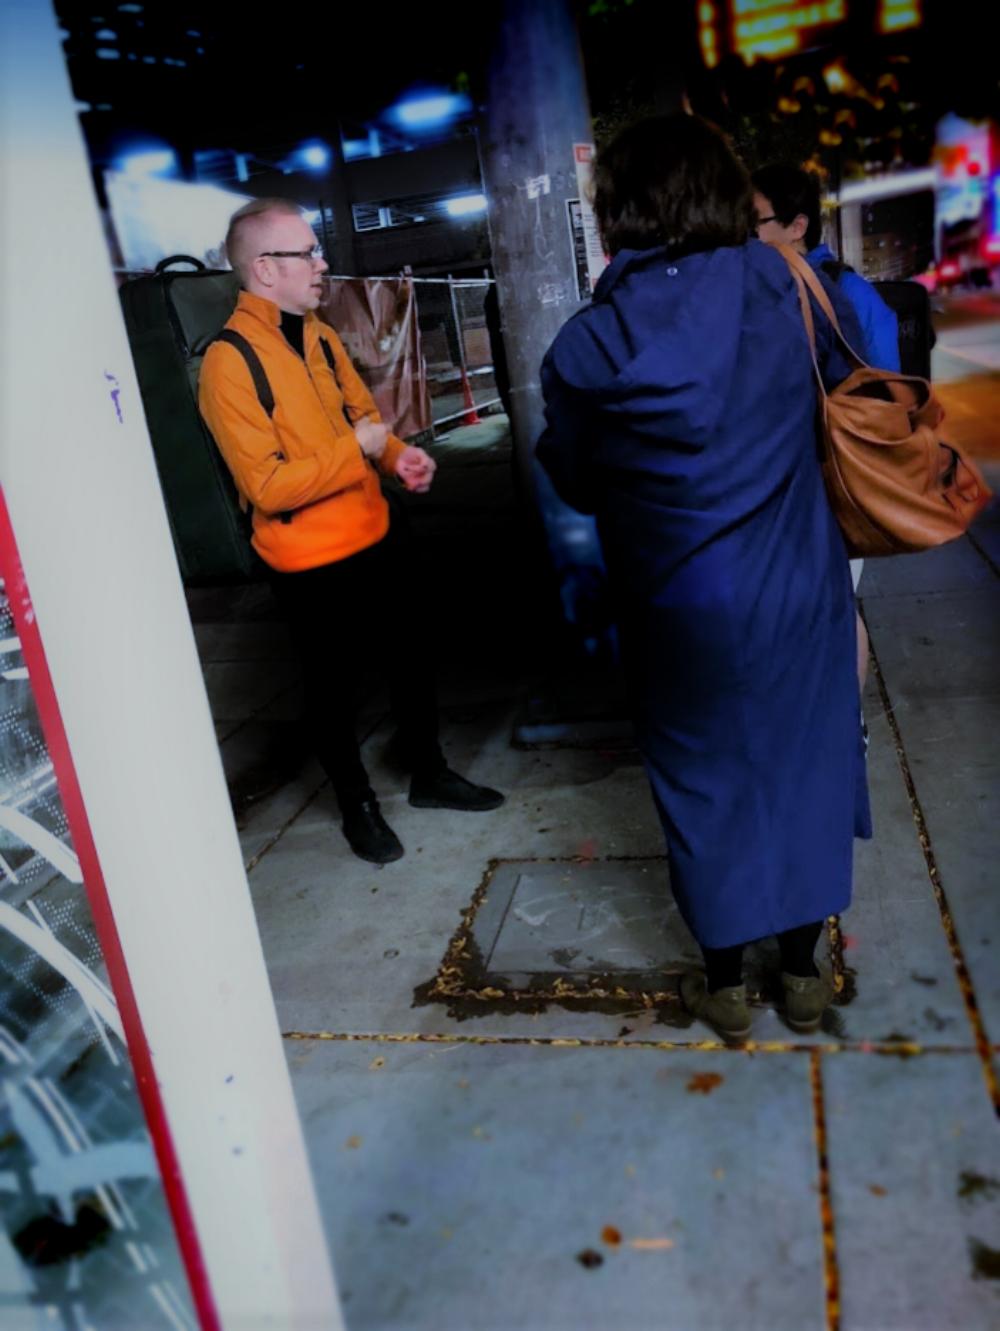 Caleb ran into a fan at the bus stop, fun conversation.